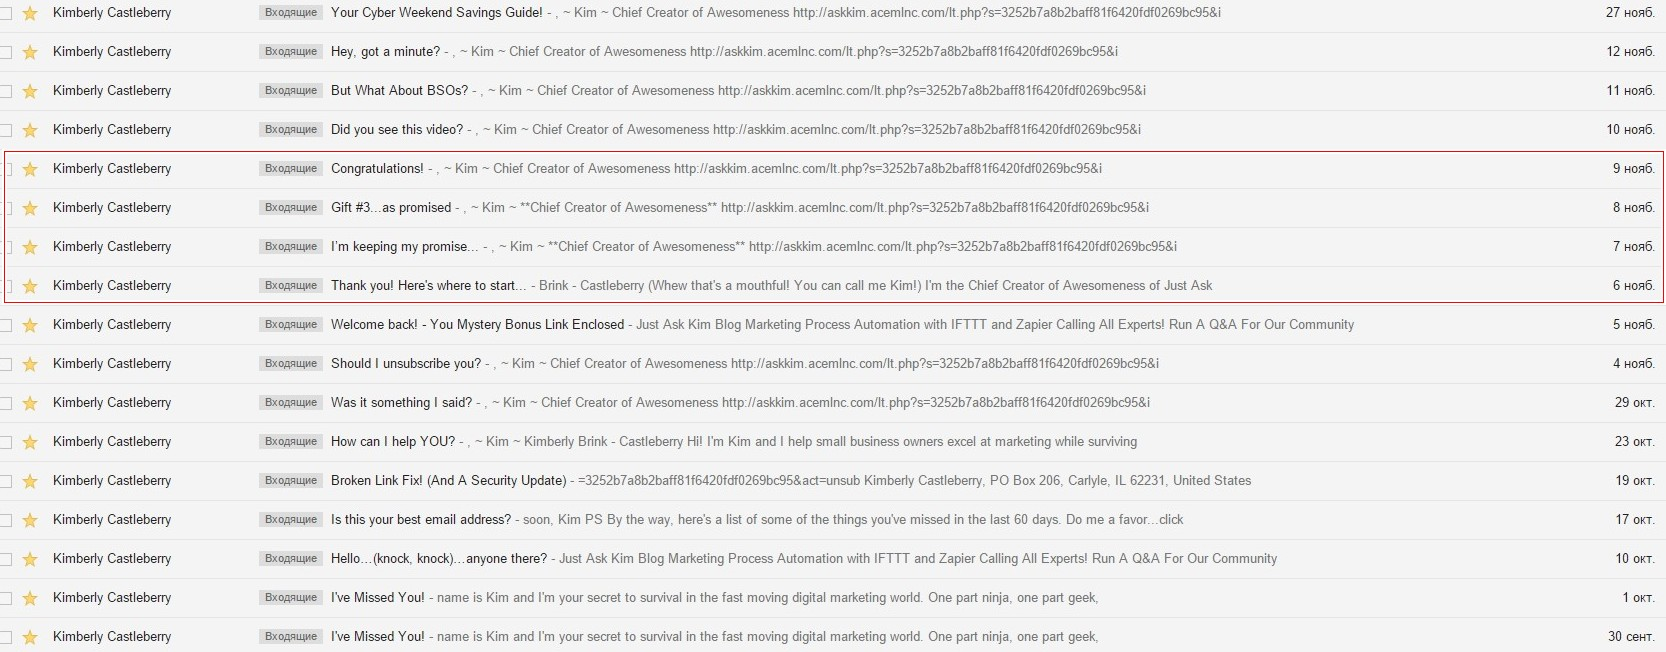 Реактивация подписчика от Ким Кастлберри